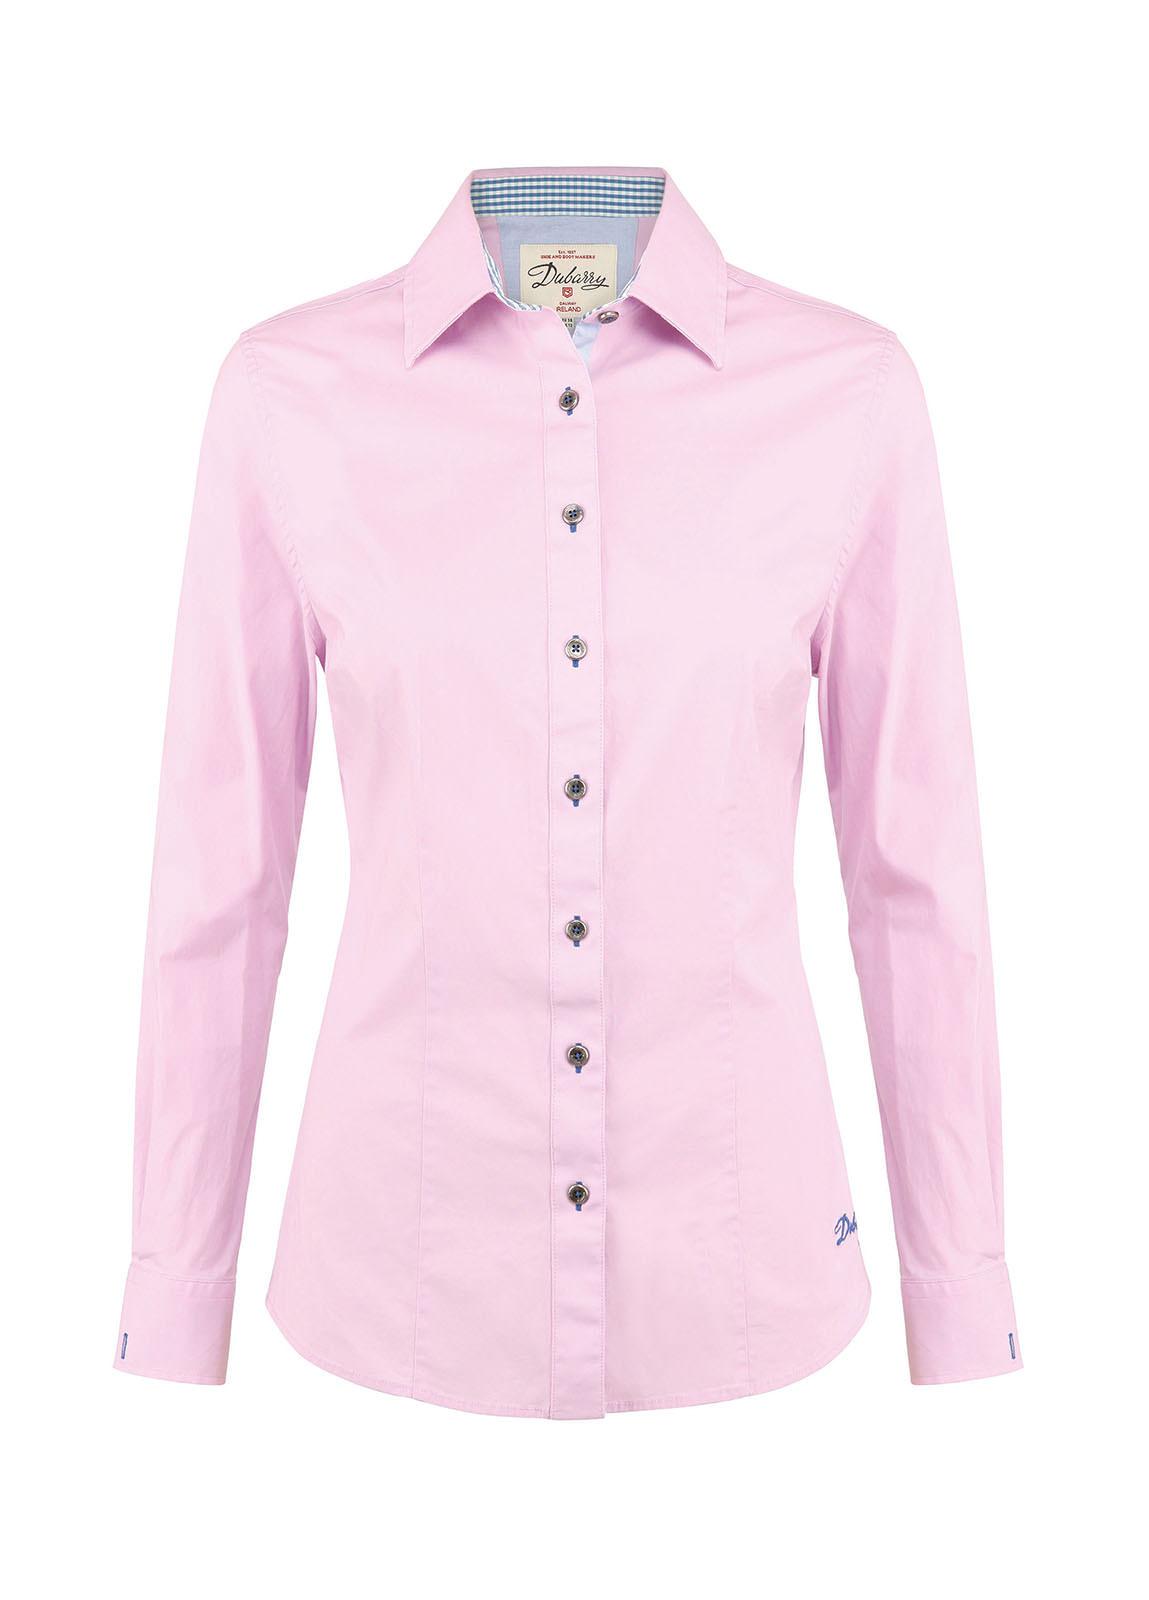 Dubarry_ Carnation Womens Shirt - Pink_Image_2